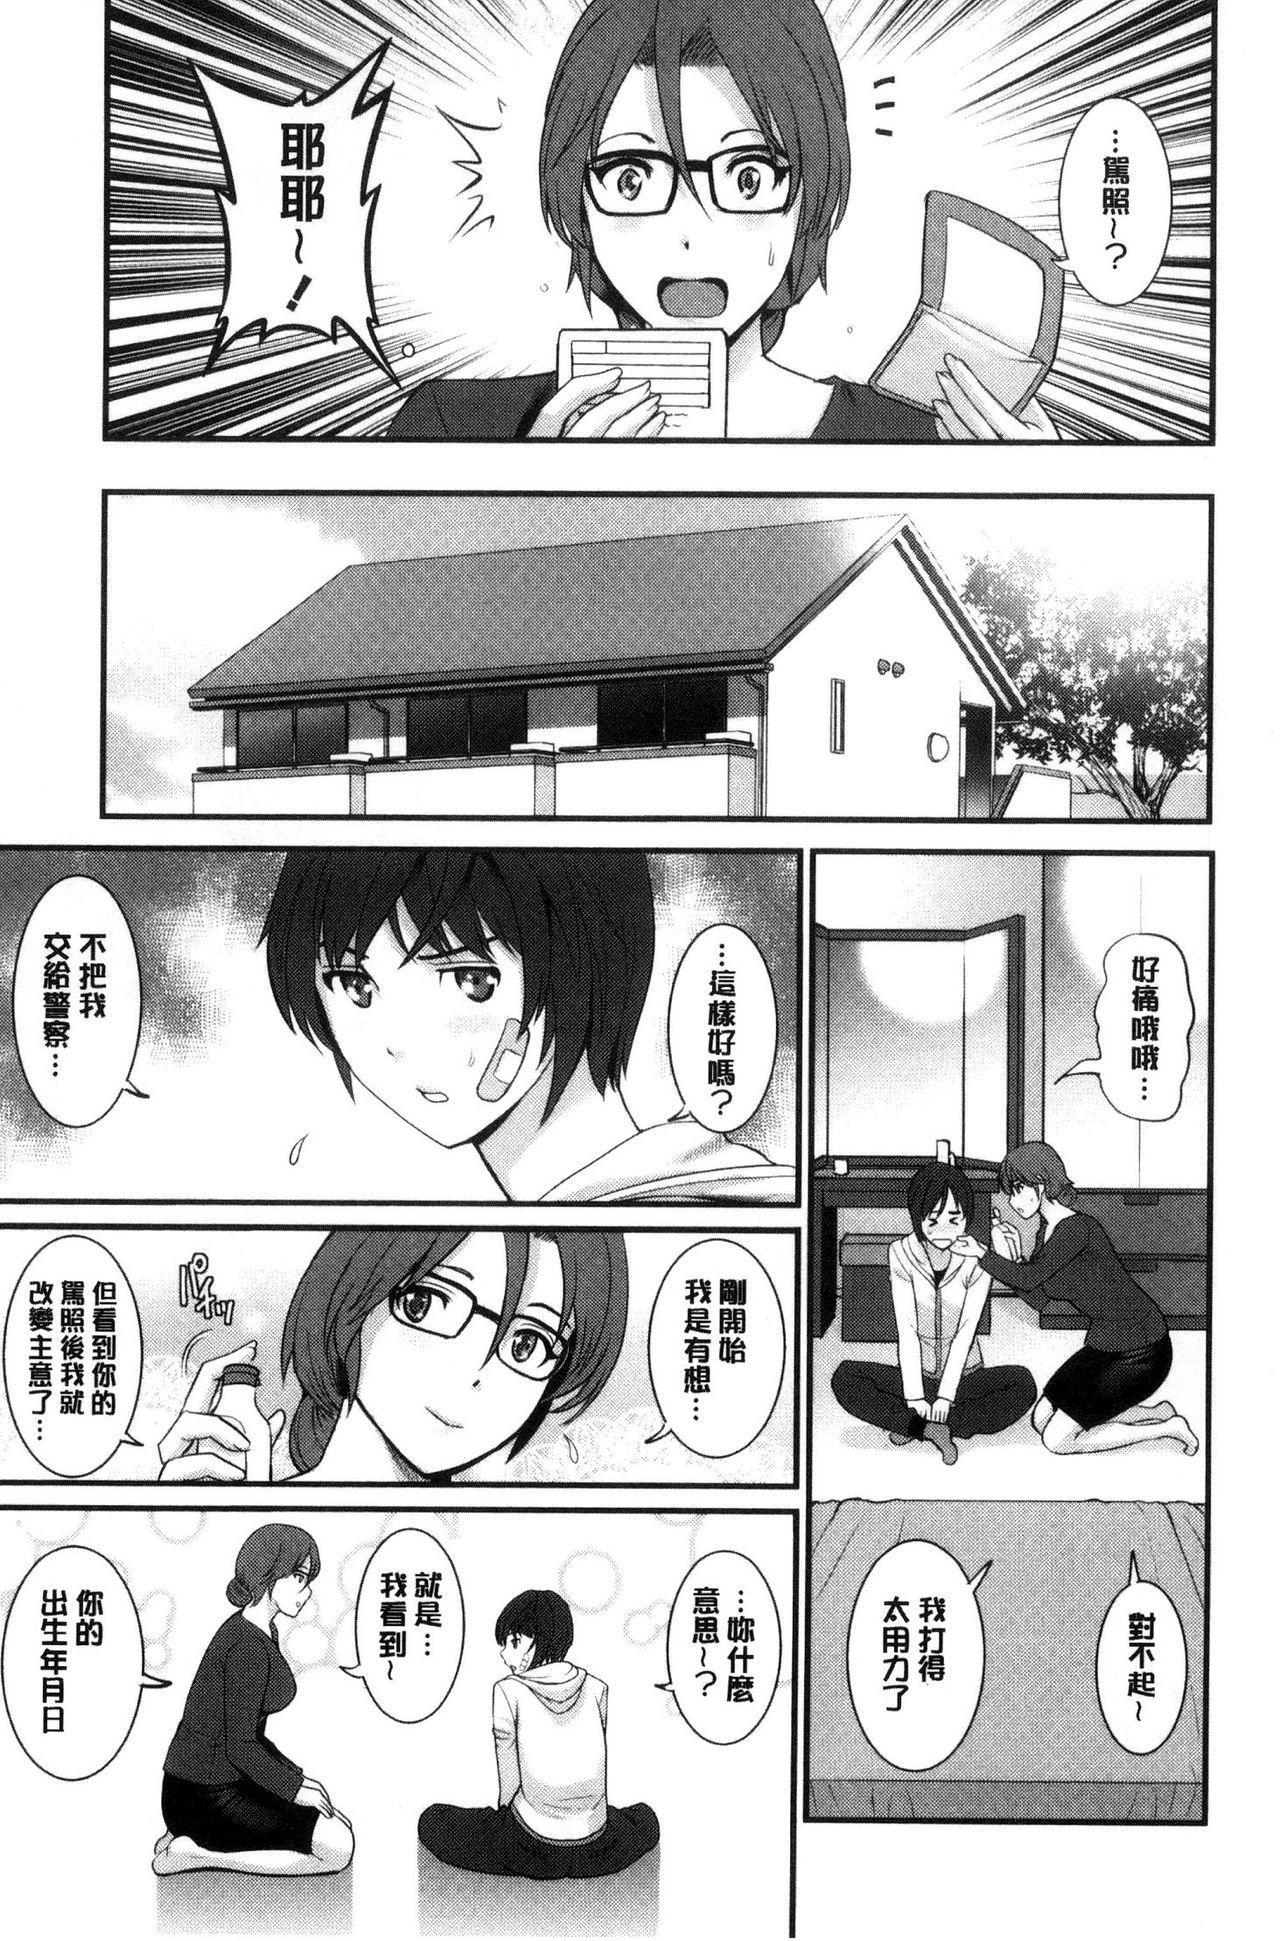 Toshimaku Sodachi no Toshima-san   年增區孕育的豐島小姐 11